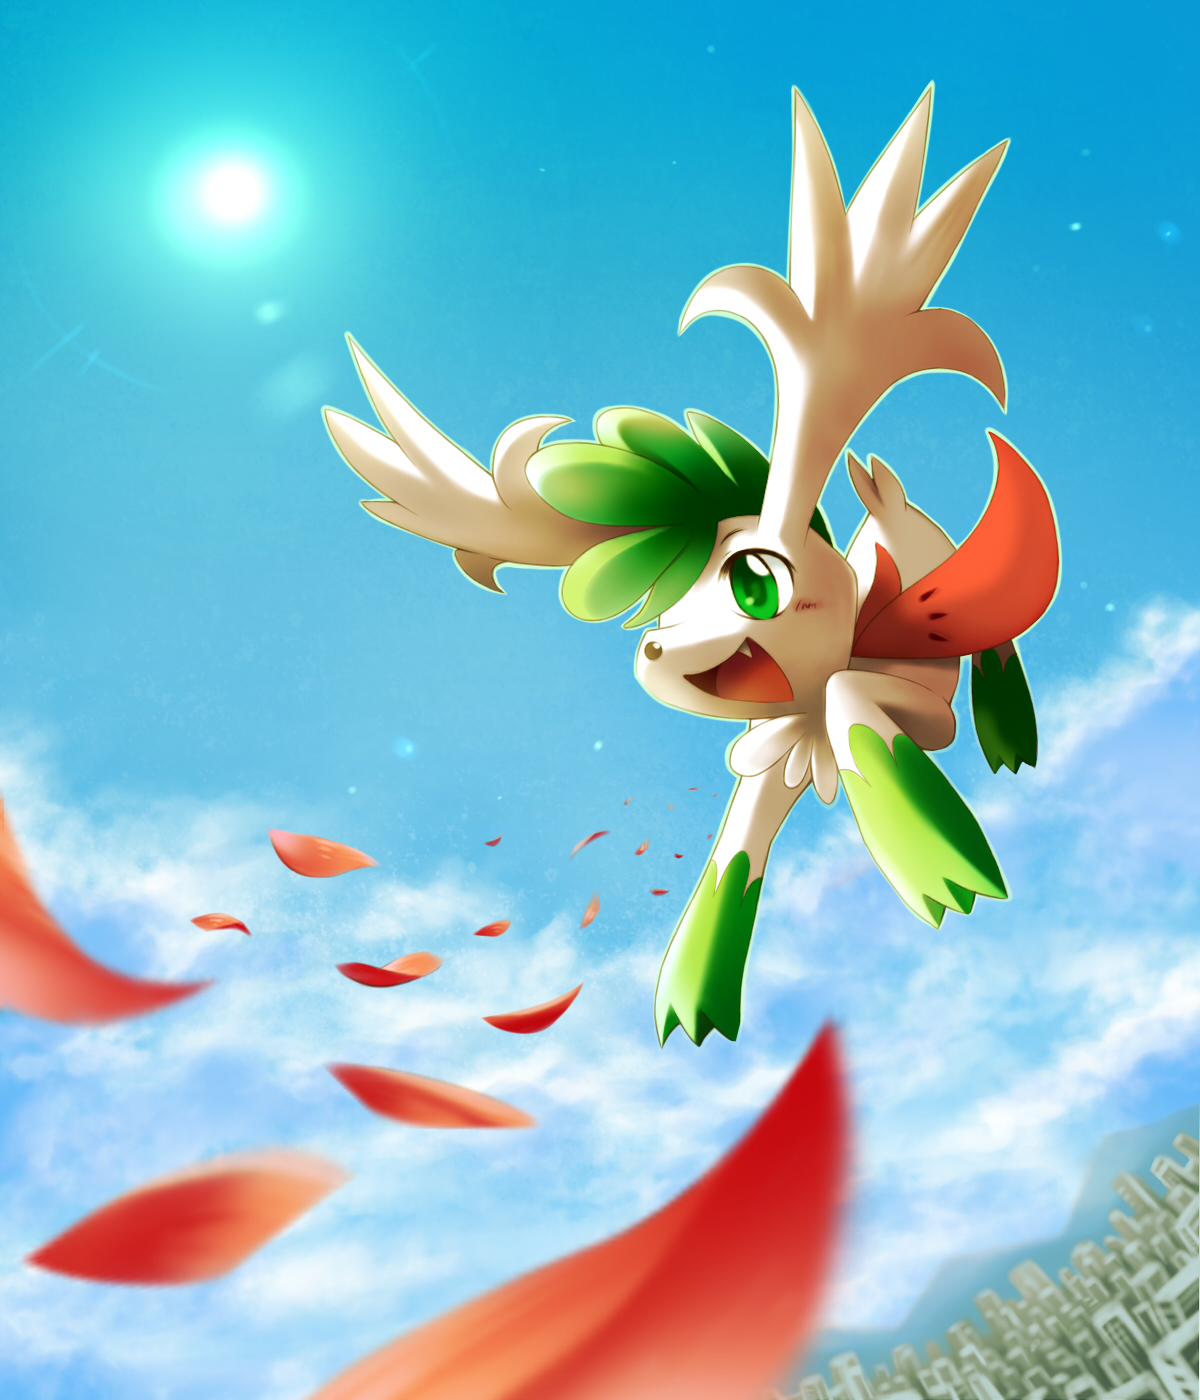 ORAS Ubers] - Mega Gengar Ft. Shaymin-Sky | Pokémon Online